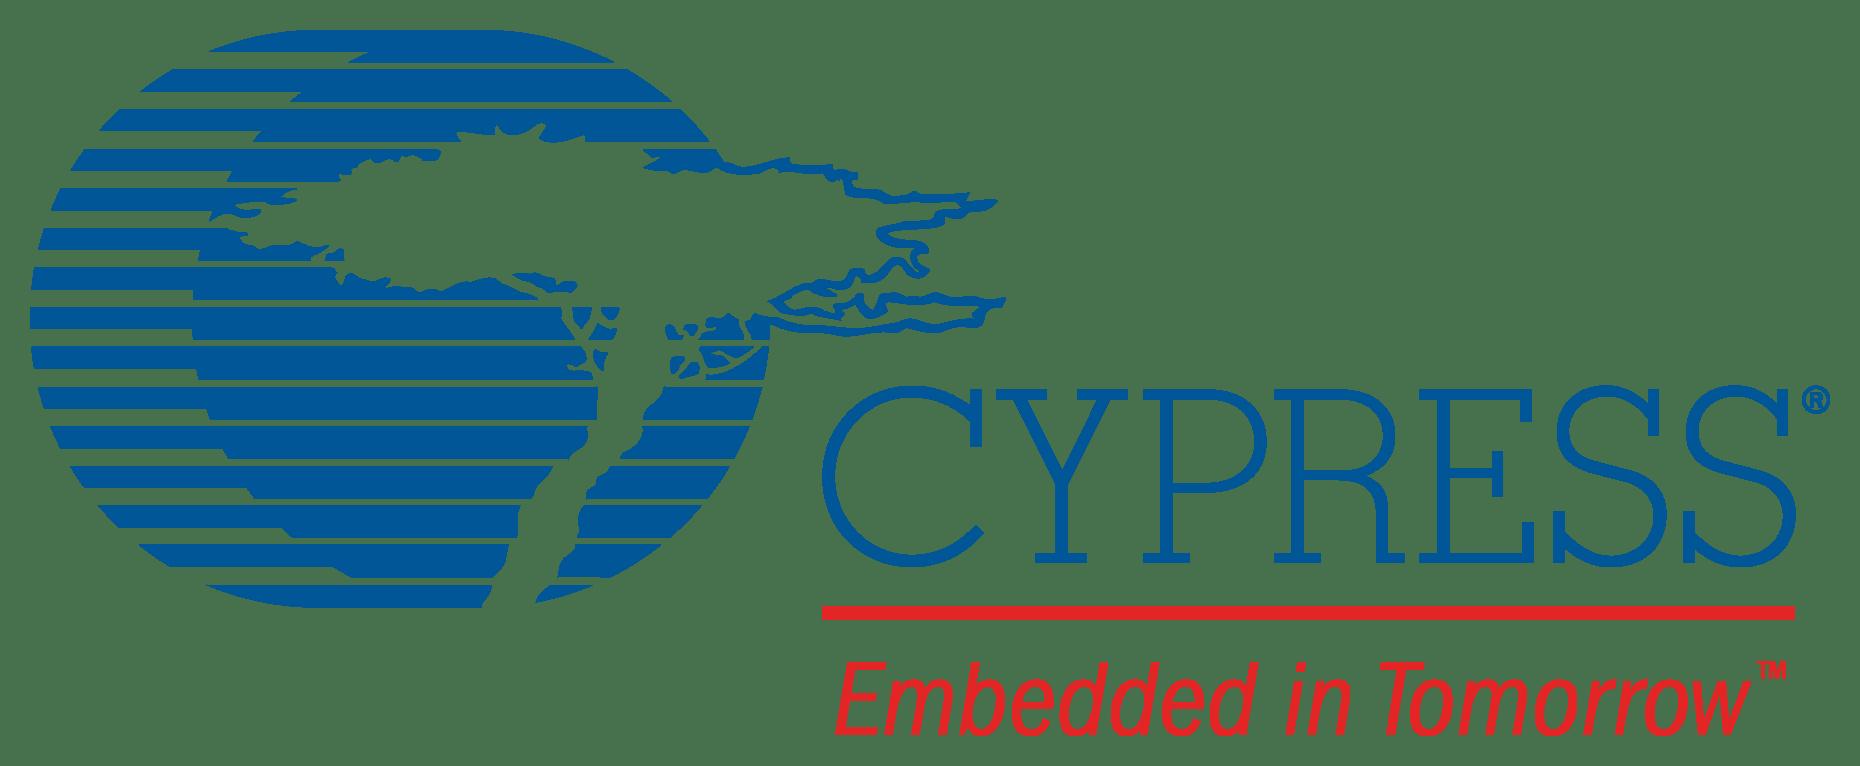 Cypress%20logo%20 %20png%20format